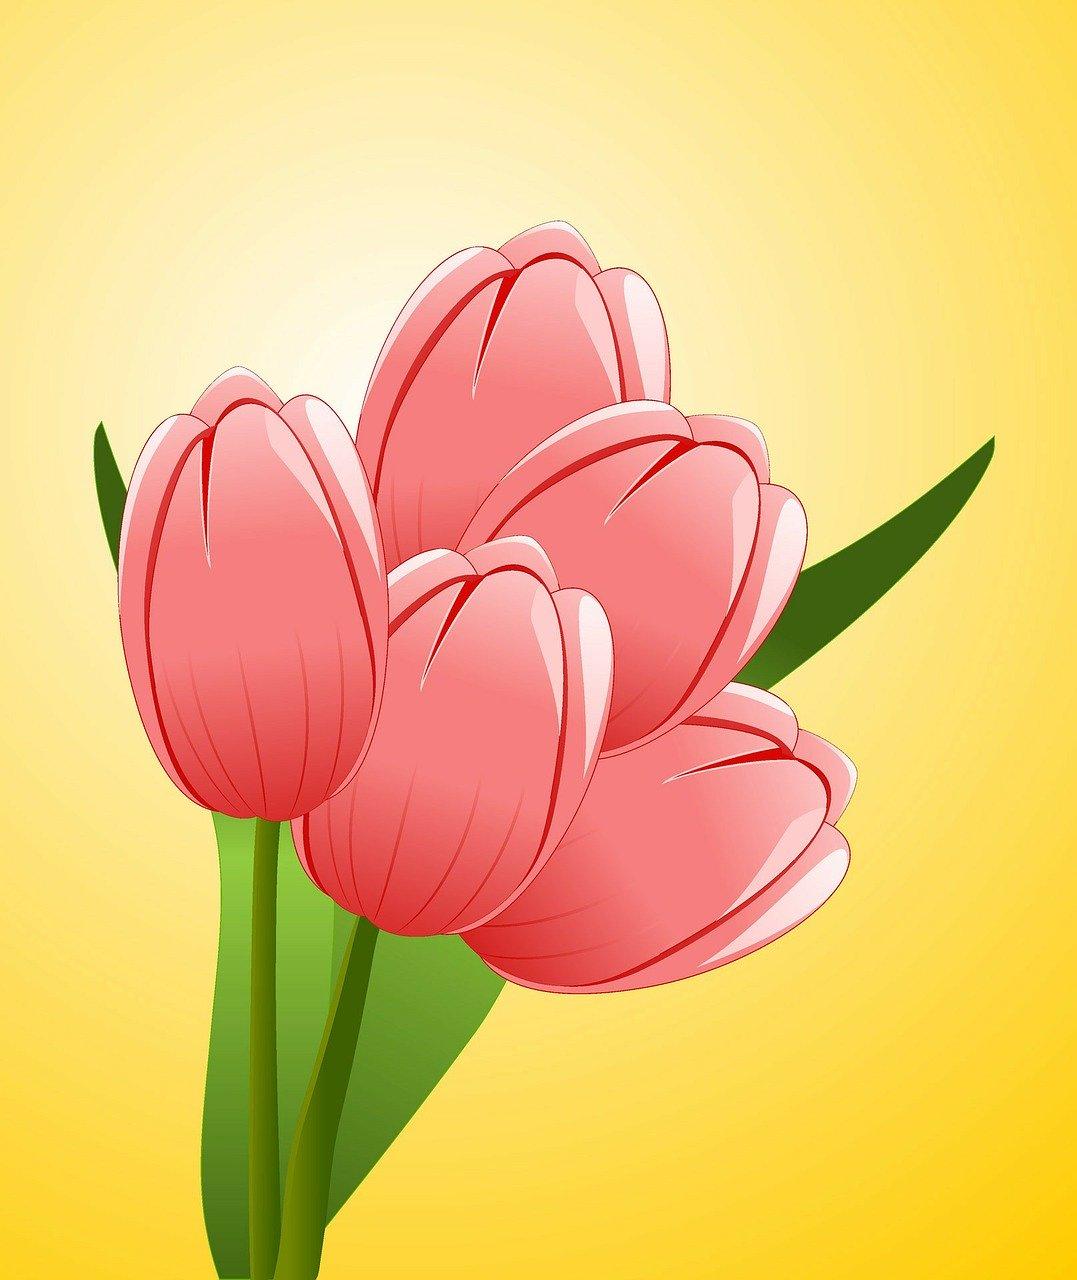 Gambar bunga tulip kartun